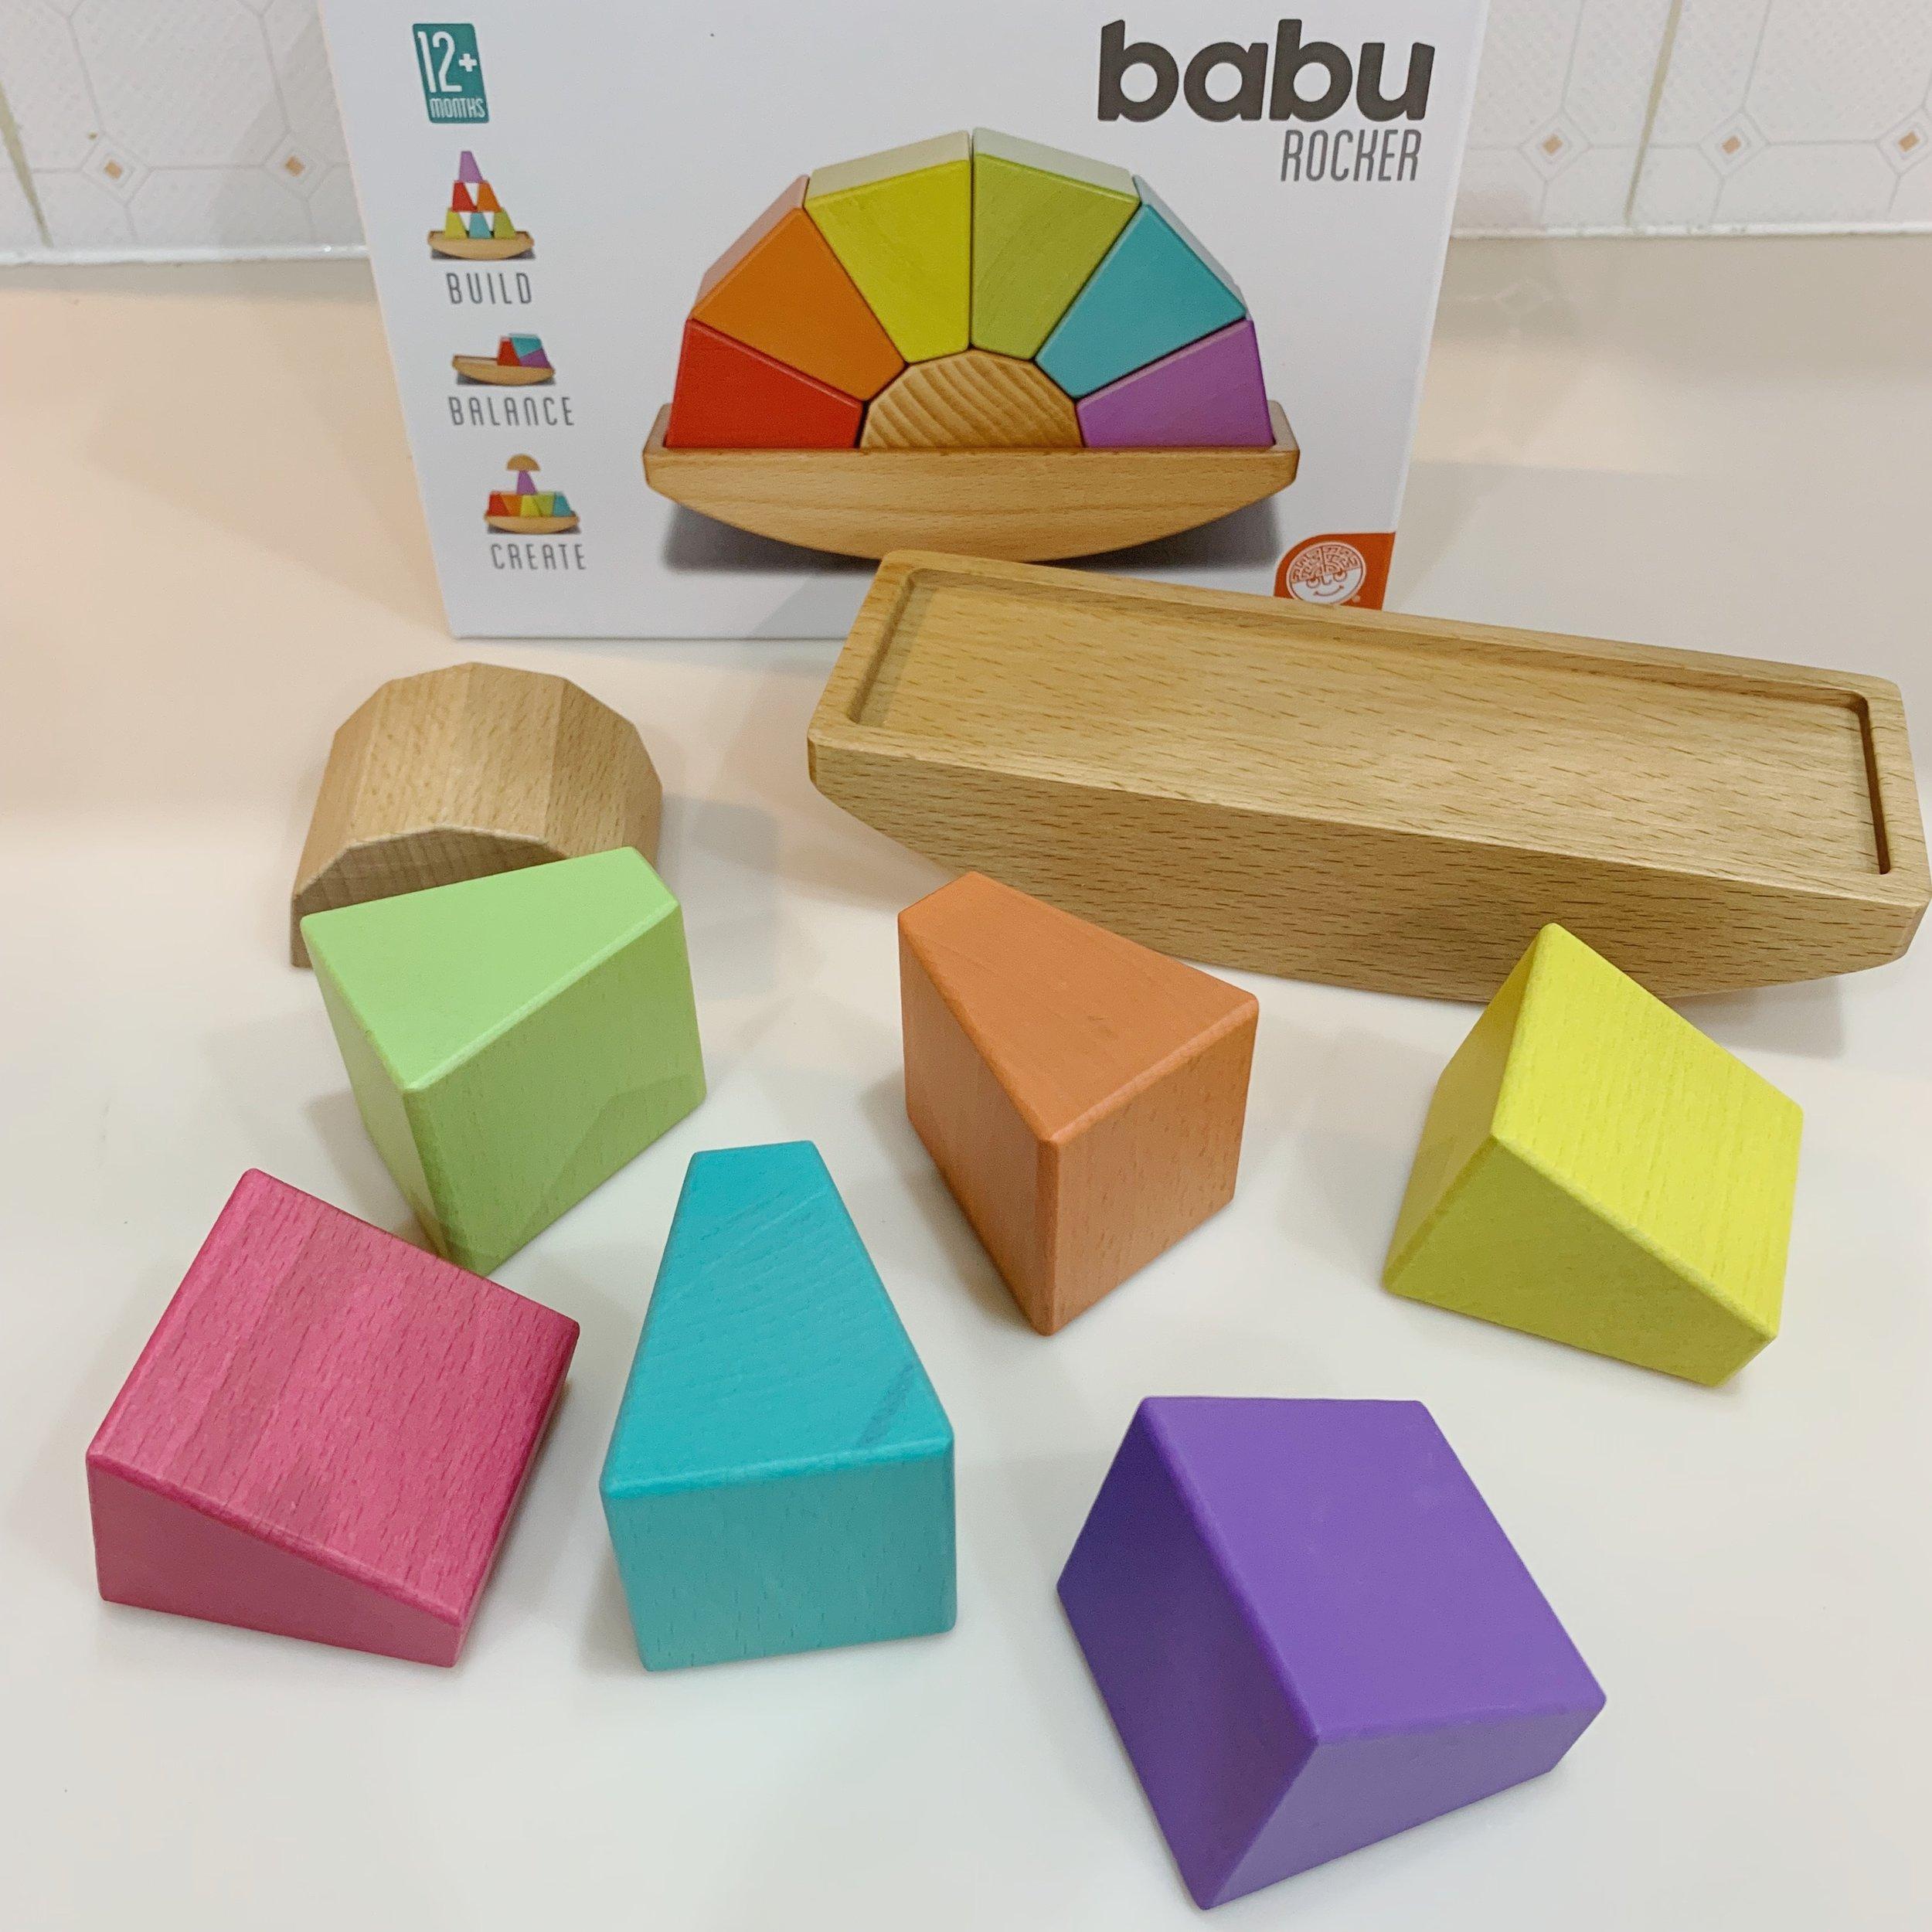 babu rocker toy